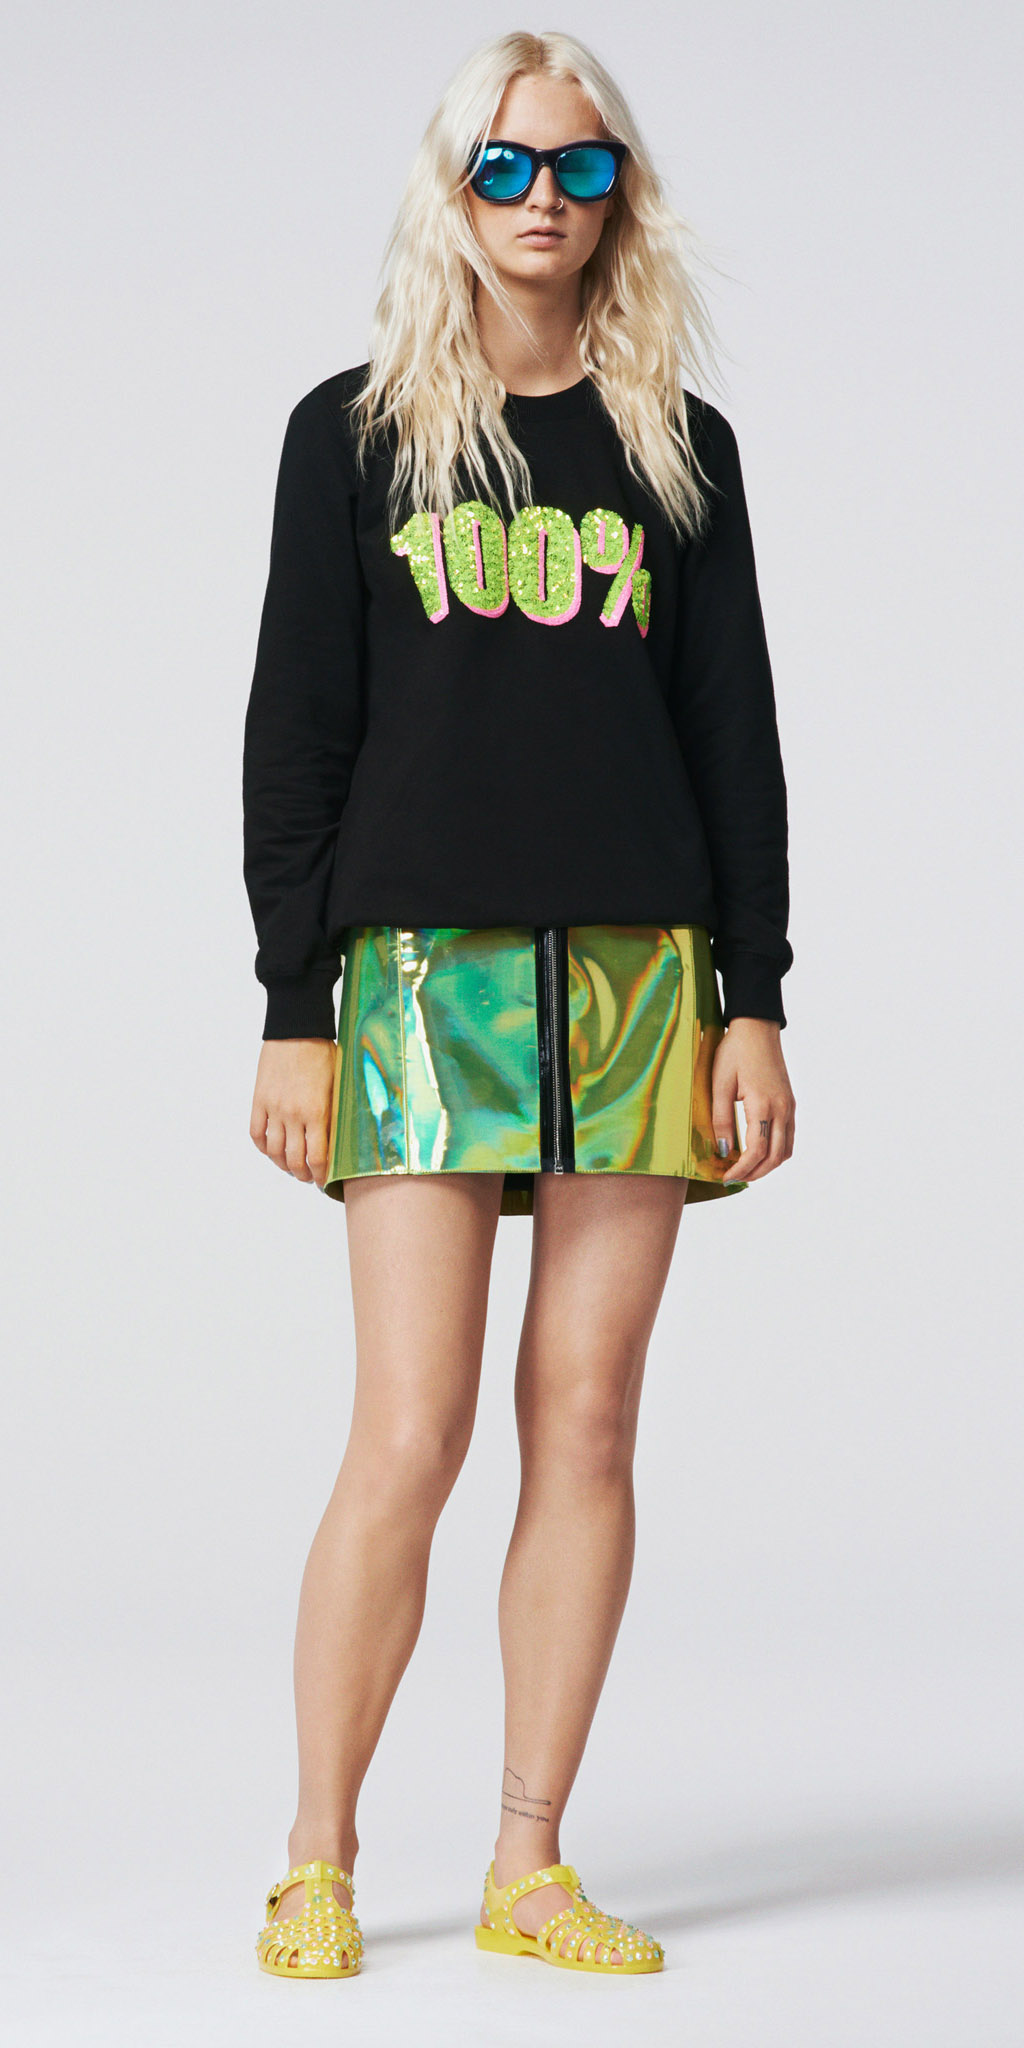 green-emerald-mini-skirt-black-sweater-sweatshirt-sun-yellow-shoe-sandals-spring-summer-blonde-weekend.jpg